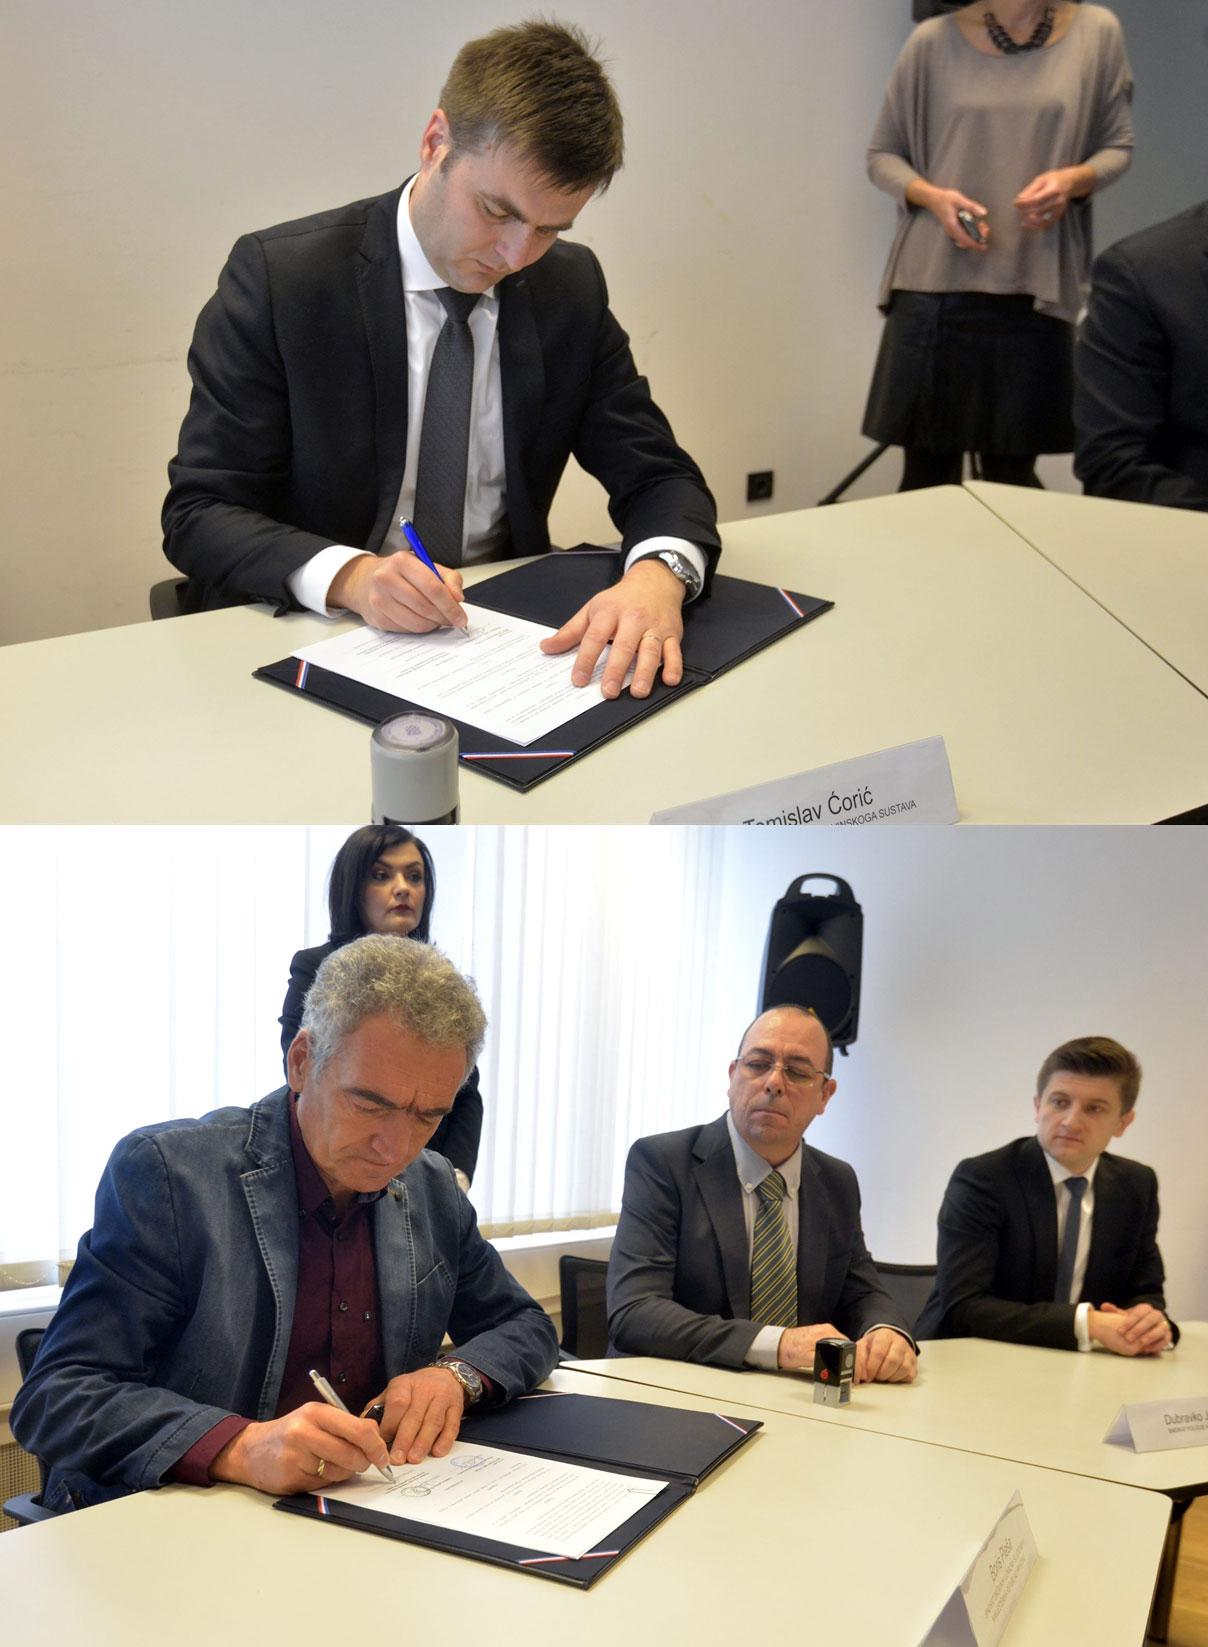 sporazum_potpisivanje_sd231216